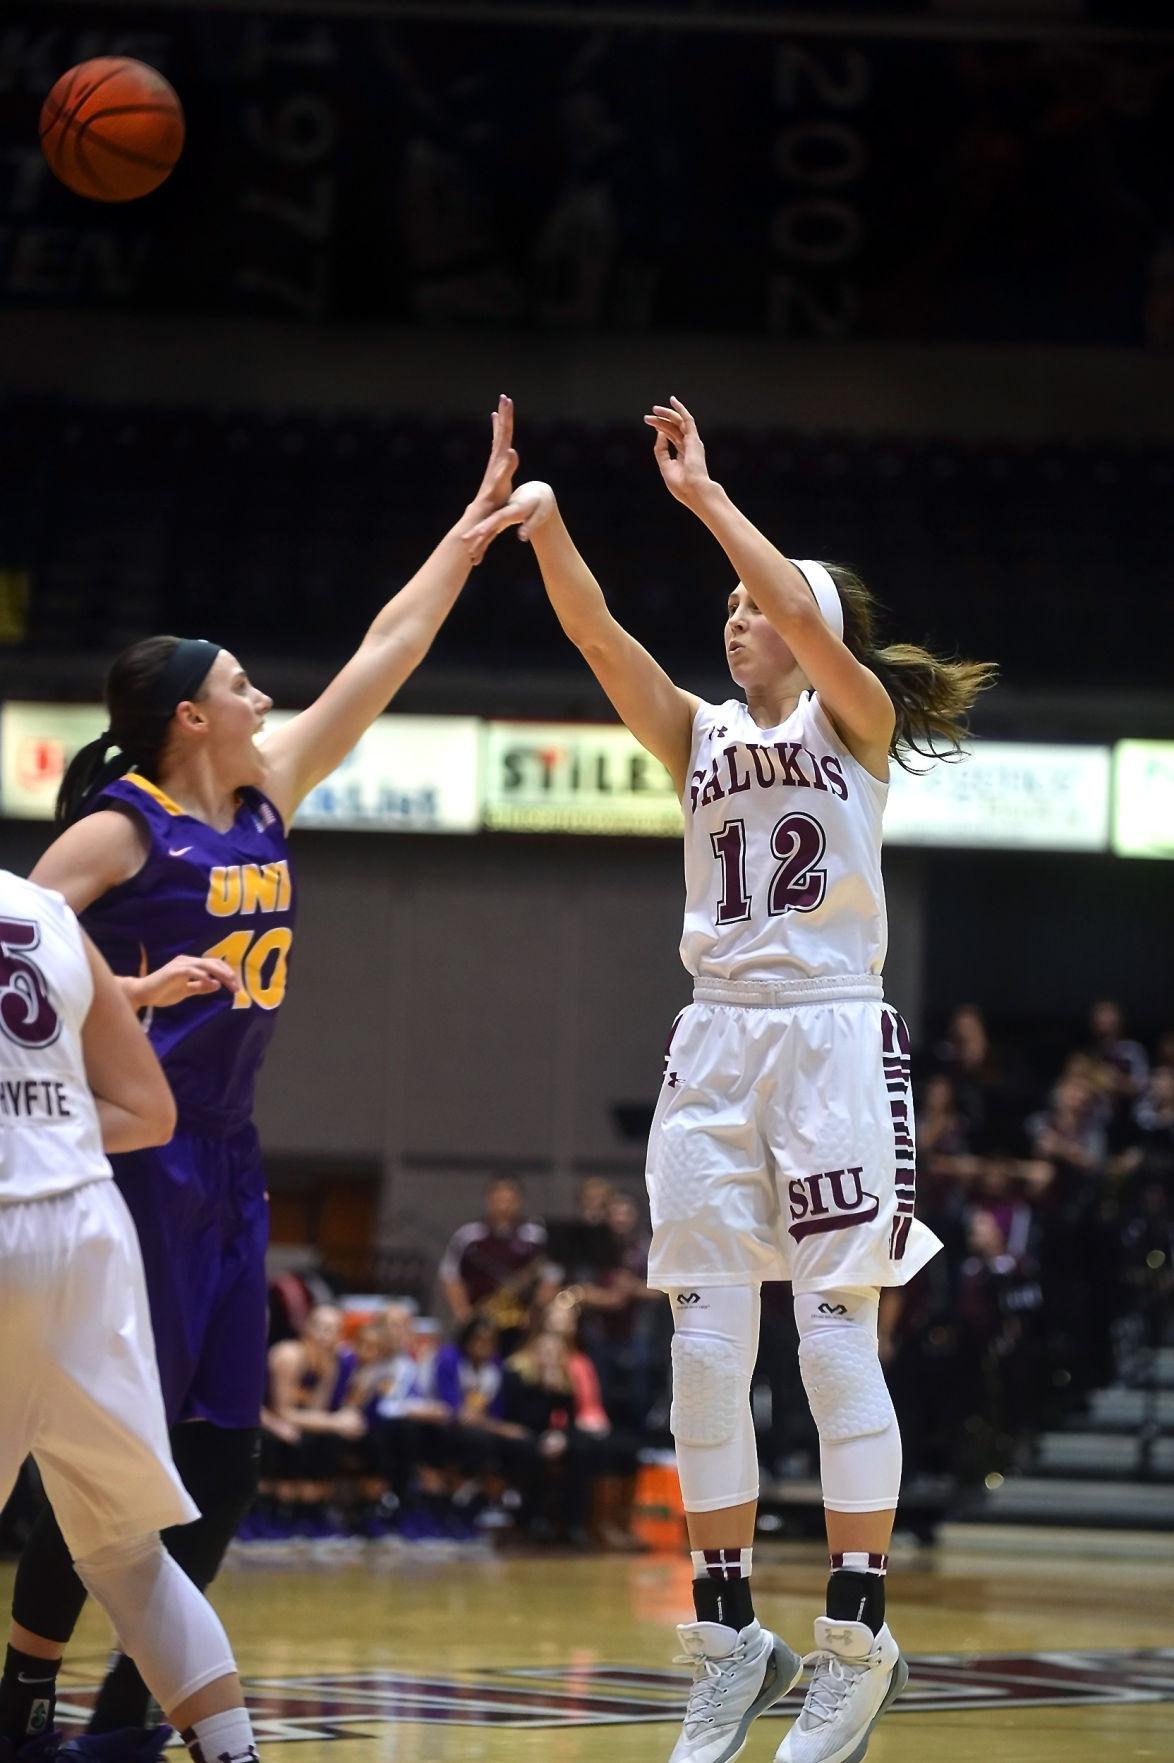 SIU Women's Basketball defeat Northern Iowa in overtime